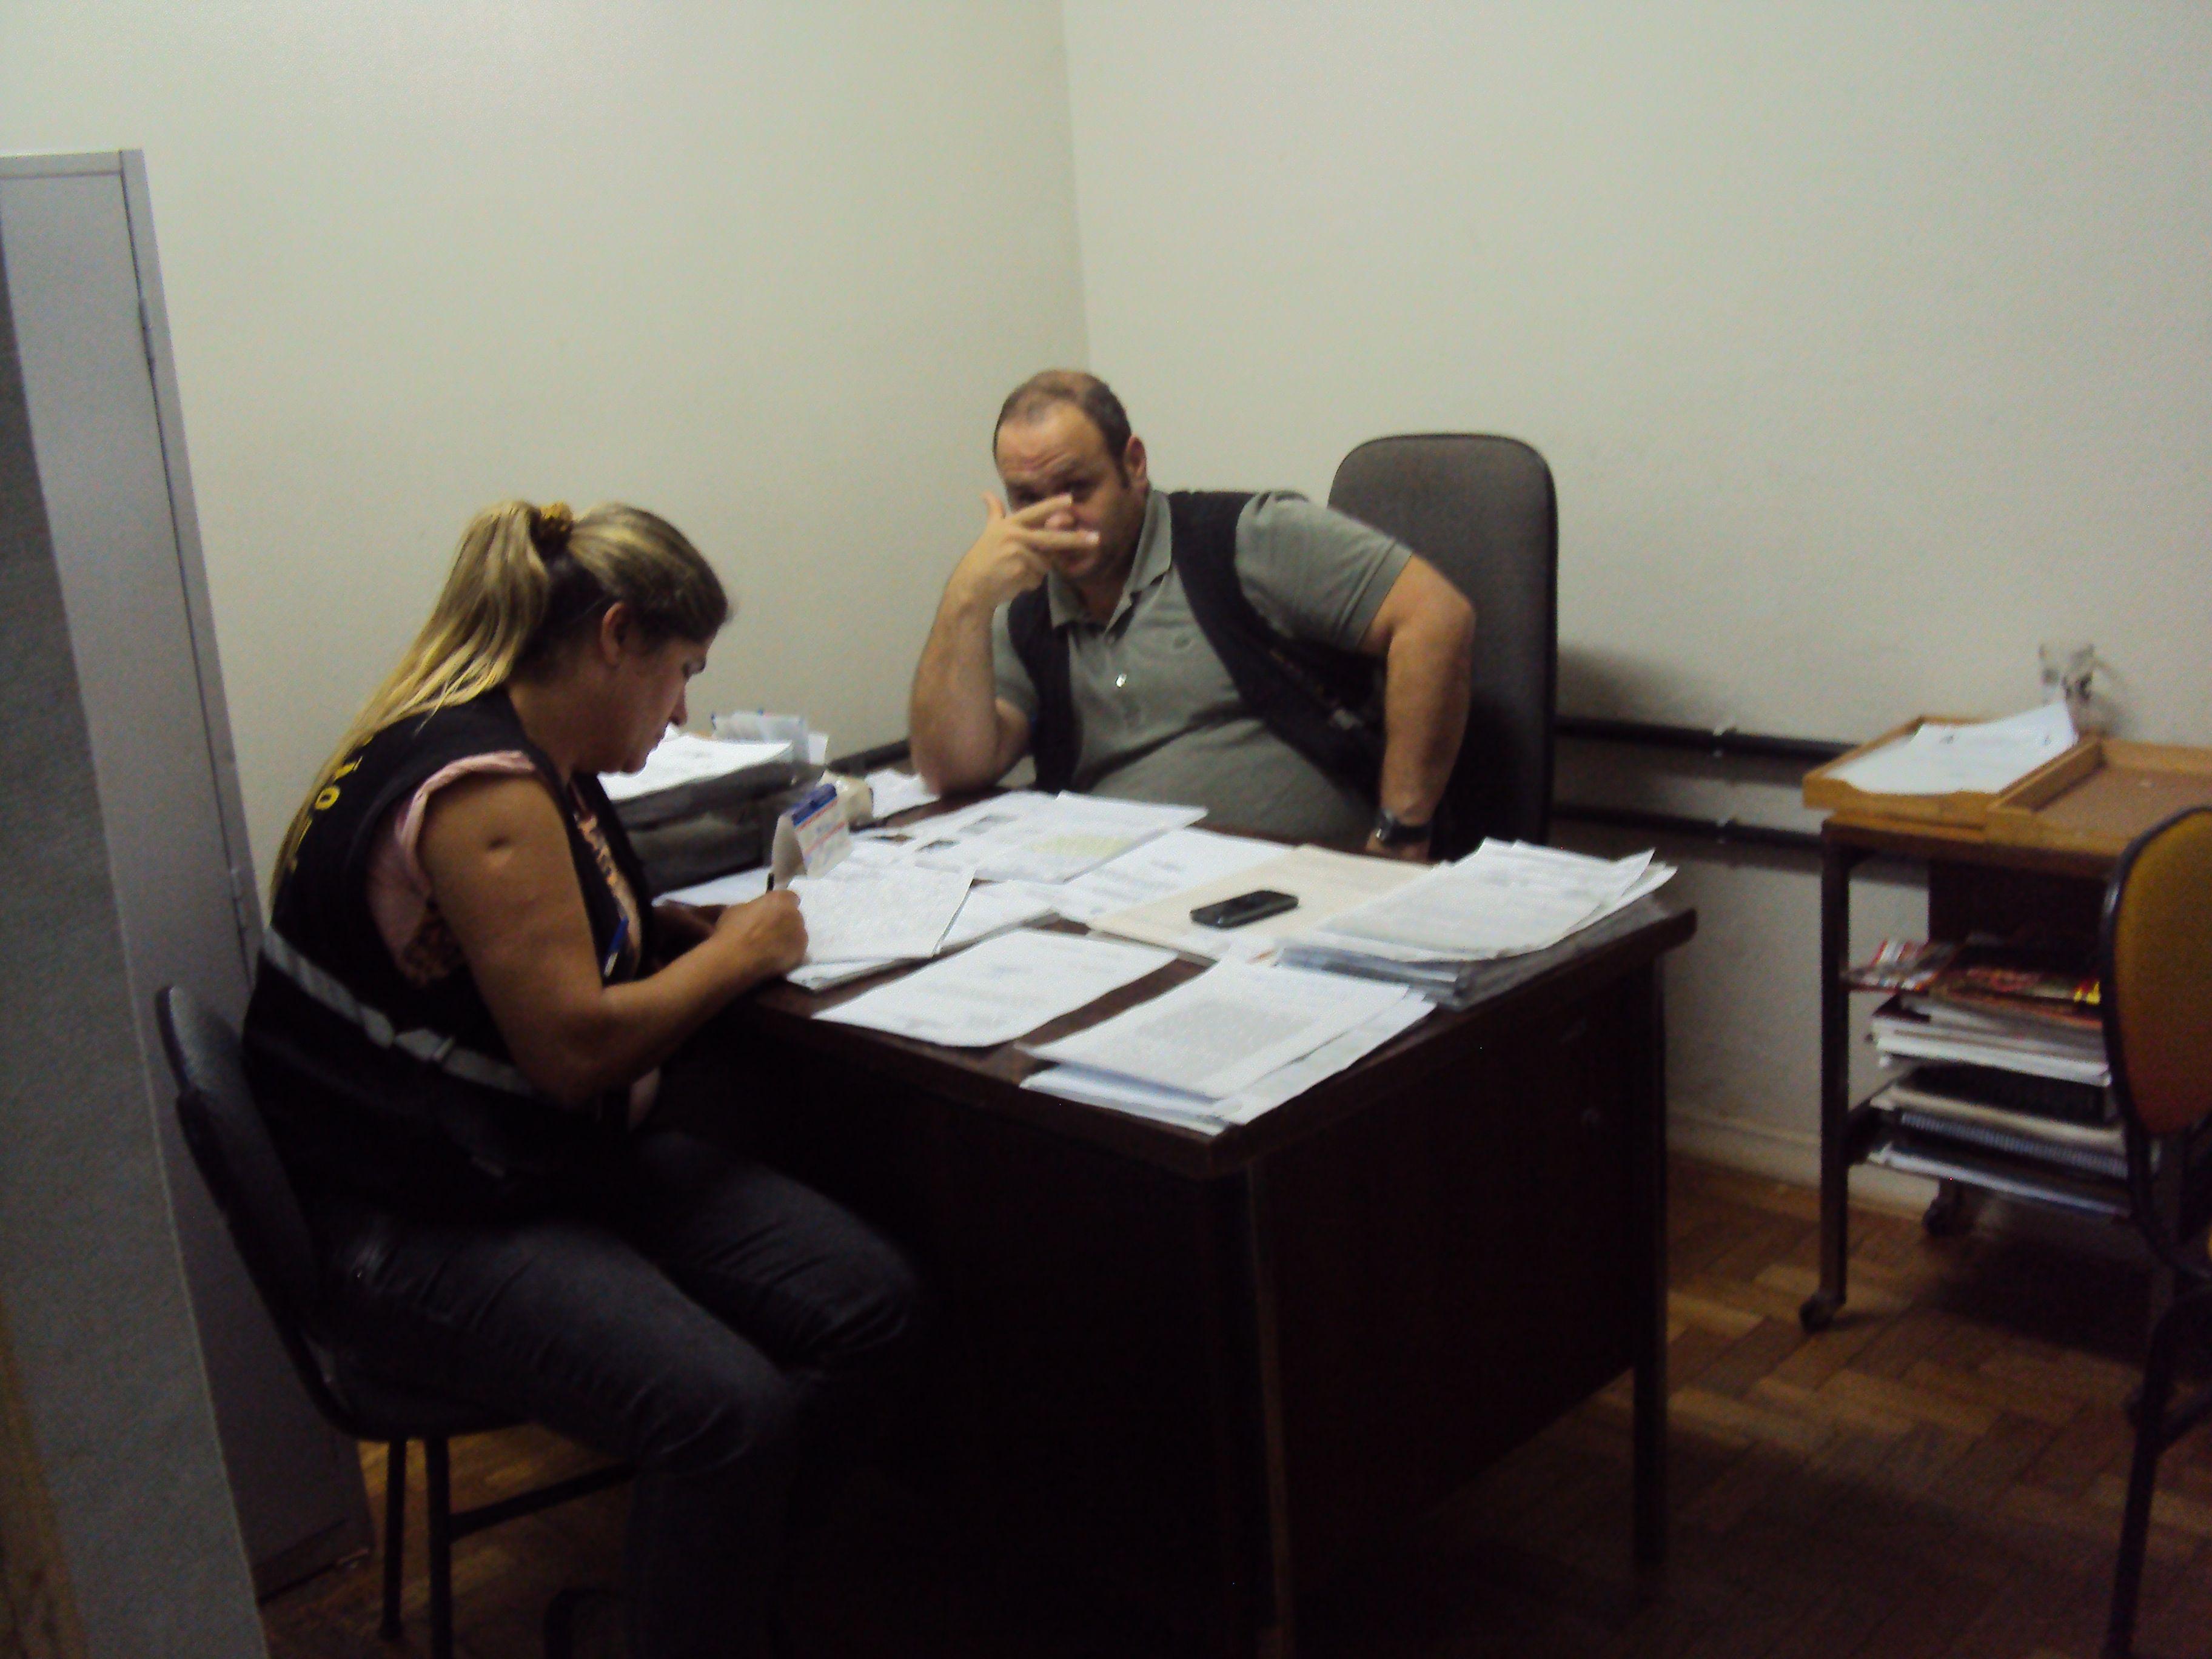 Chefe Bruno da Costa Pinto, Superintendente de Meio Ambiente, e Palmira